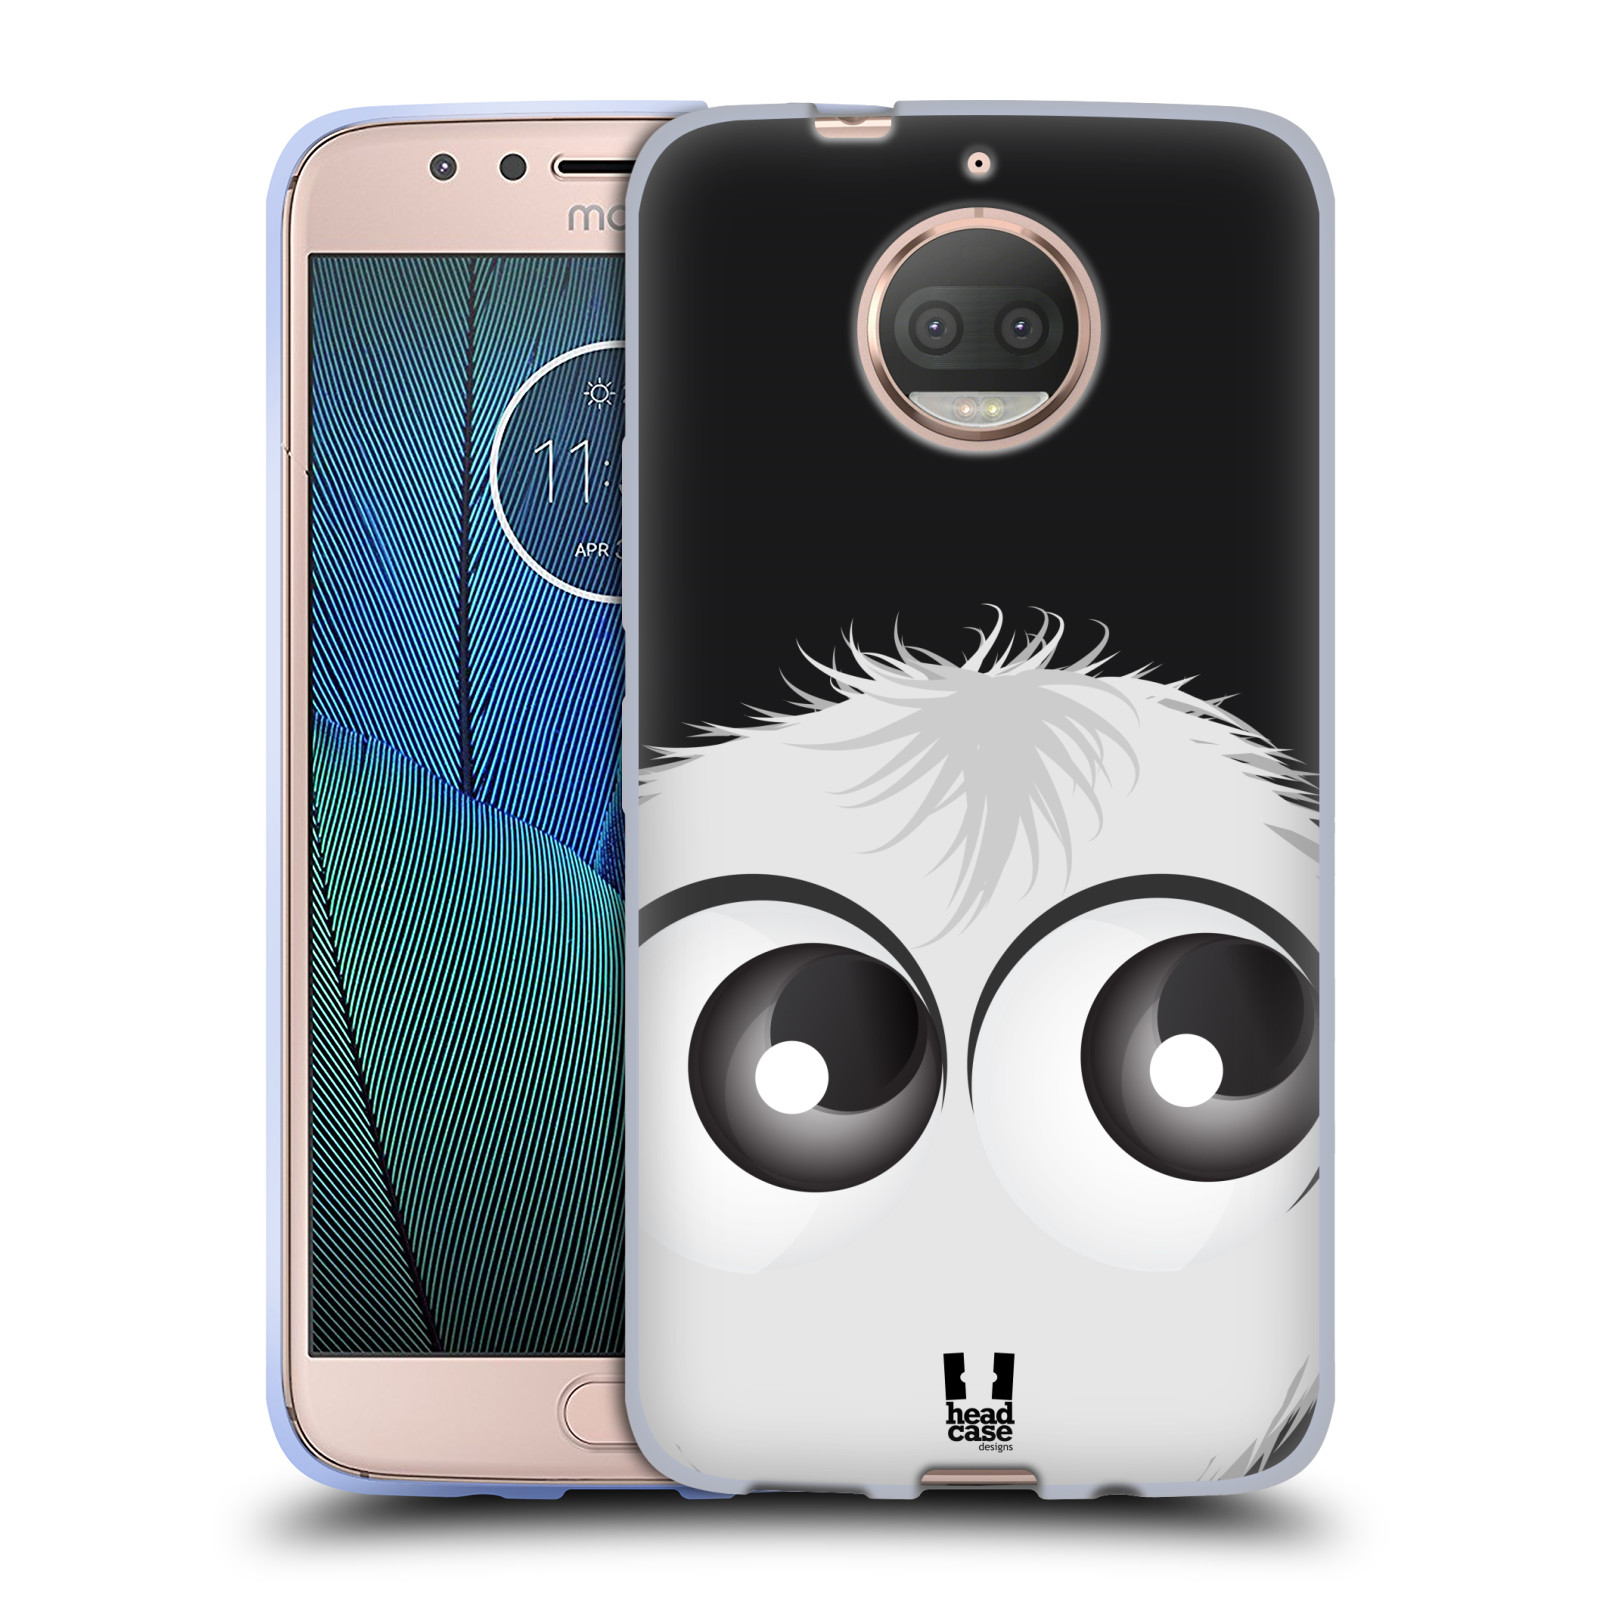 Silikonové pouzdro na mobil Lenovo Moto G5s Plus - Head Case - FUZÍK BÍLÝ (Silikonový kryt či obal na mobilní telefon (Motorola) Lenovo Moto G5s Plus s motivem FUZÍK BÍLÝ)